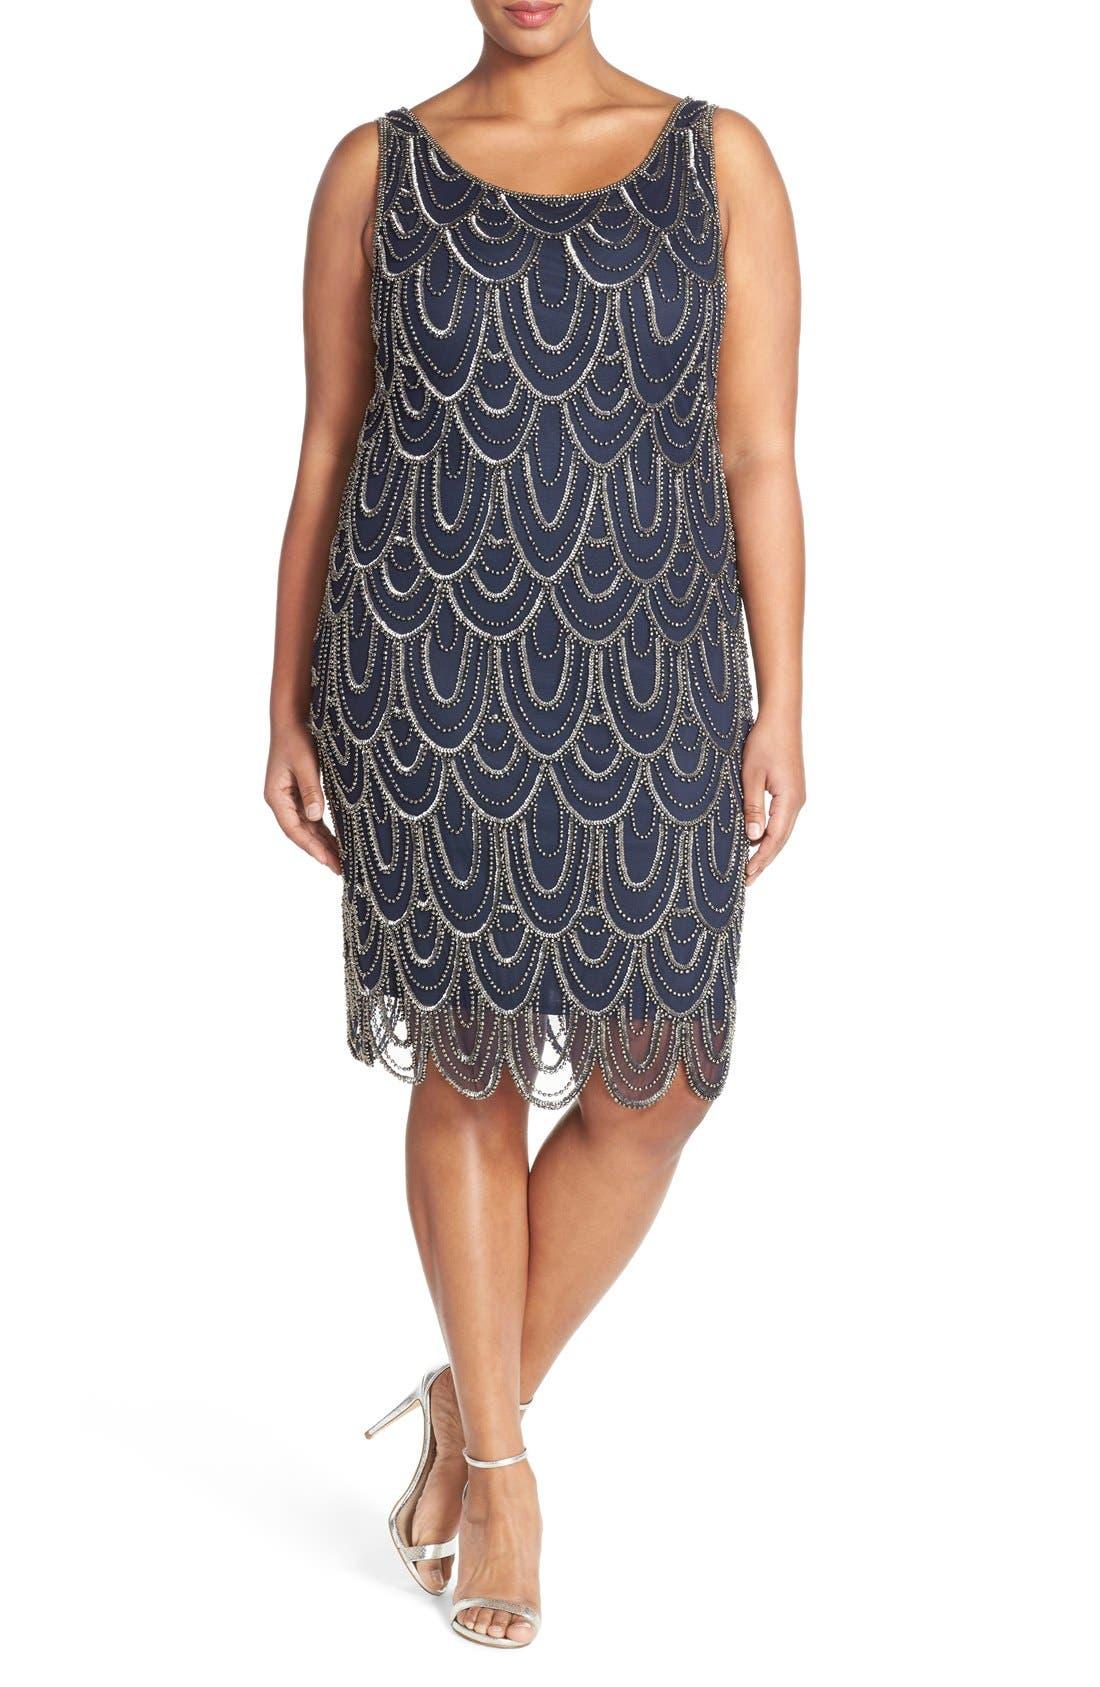 PISARRO NIGHTS, Beaded Sheath Dress, Main thumbnail 1, color, 410